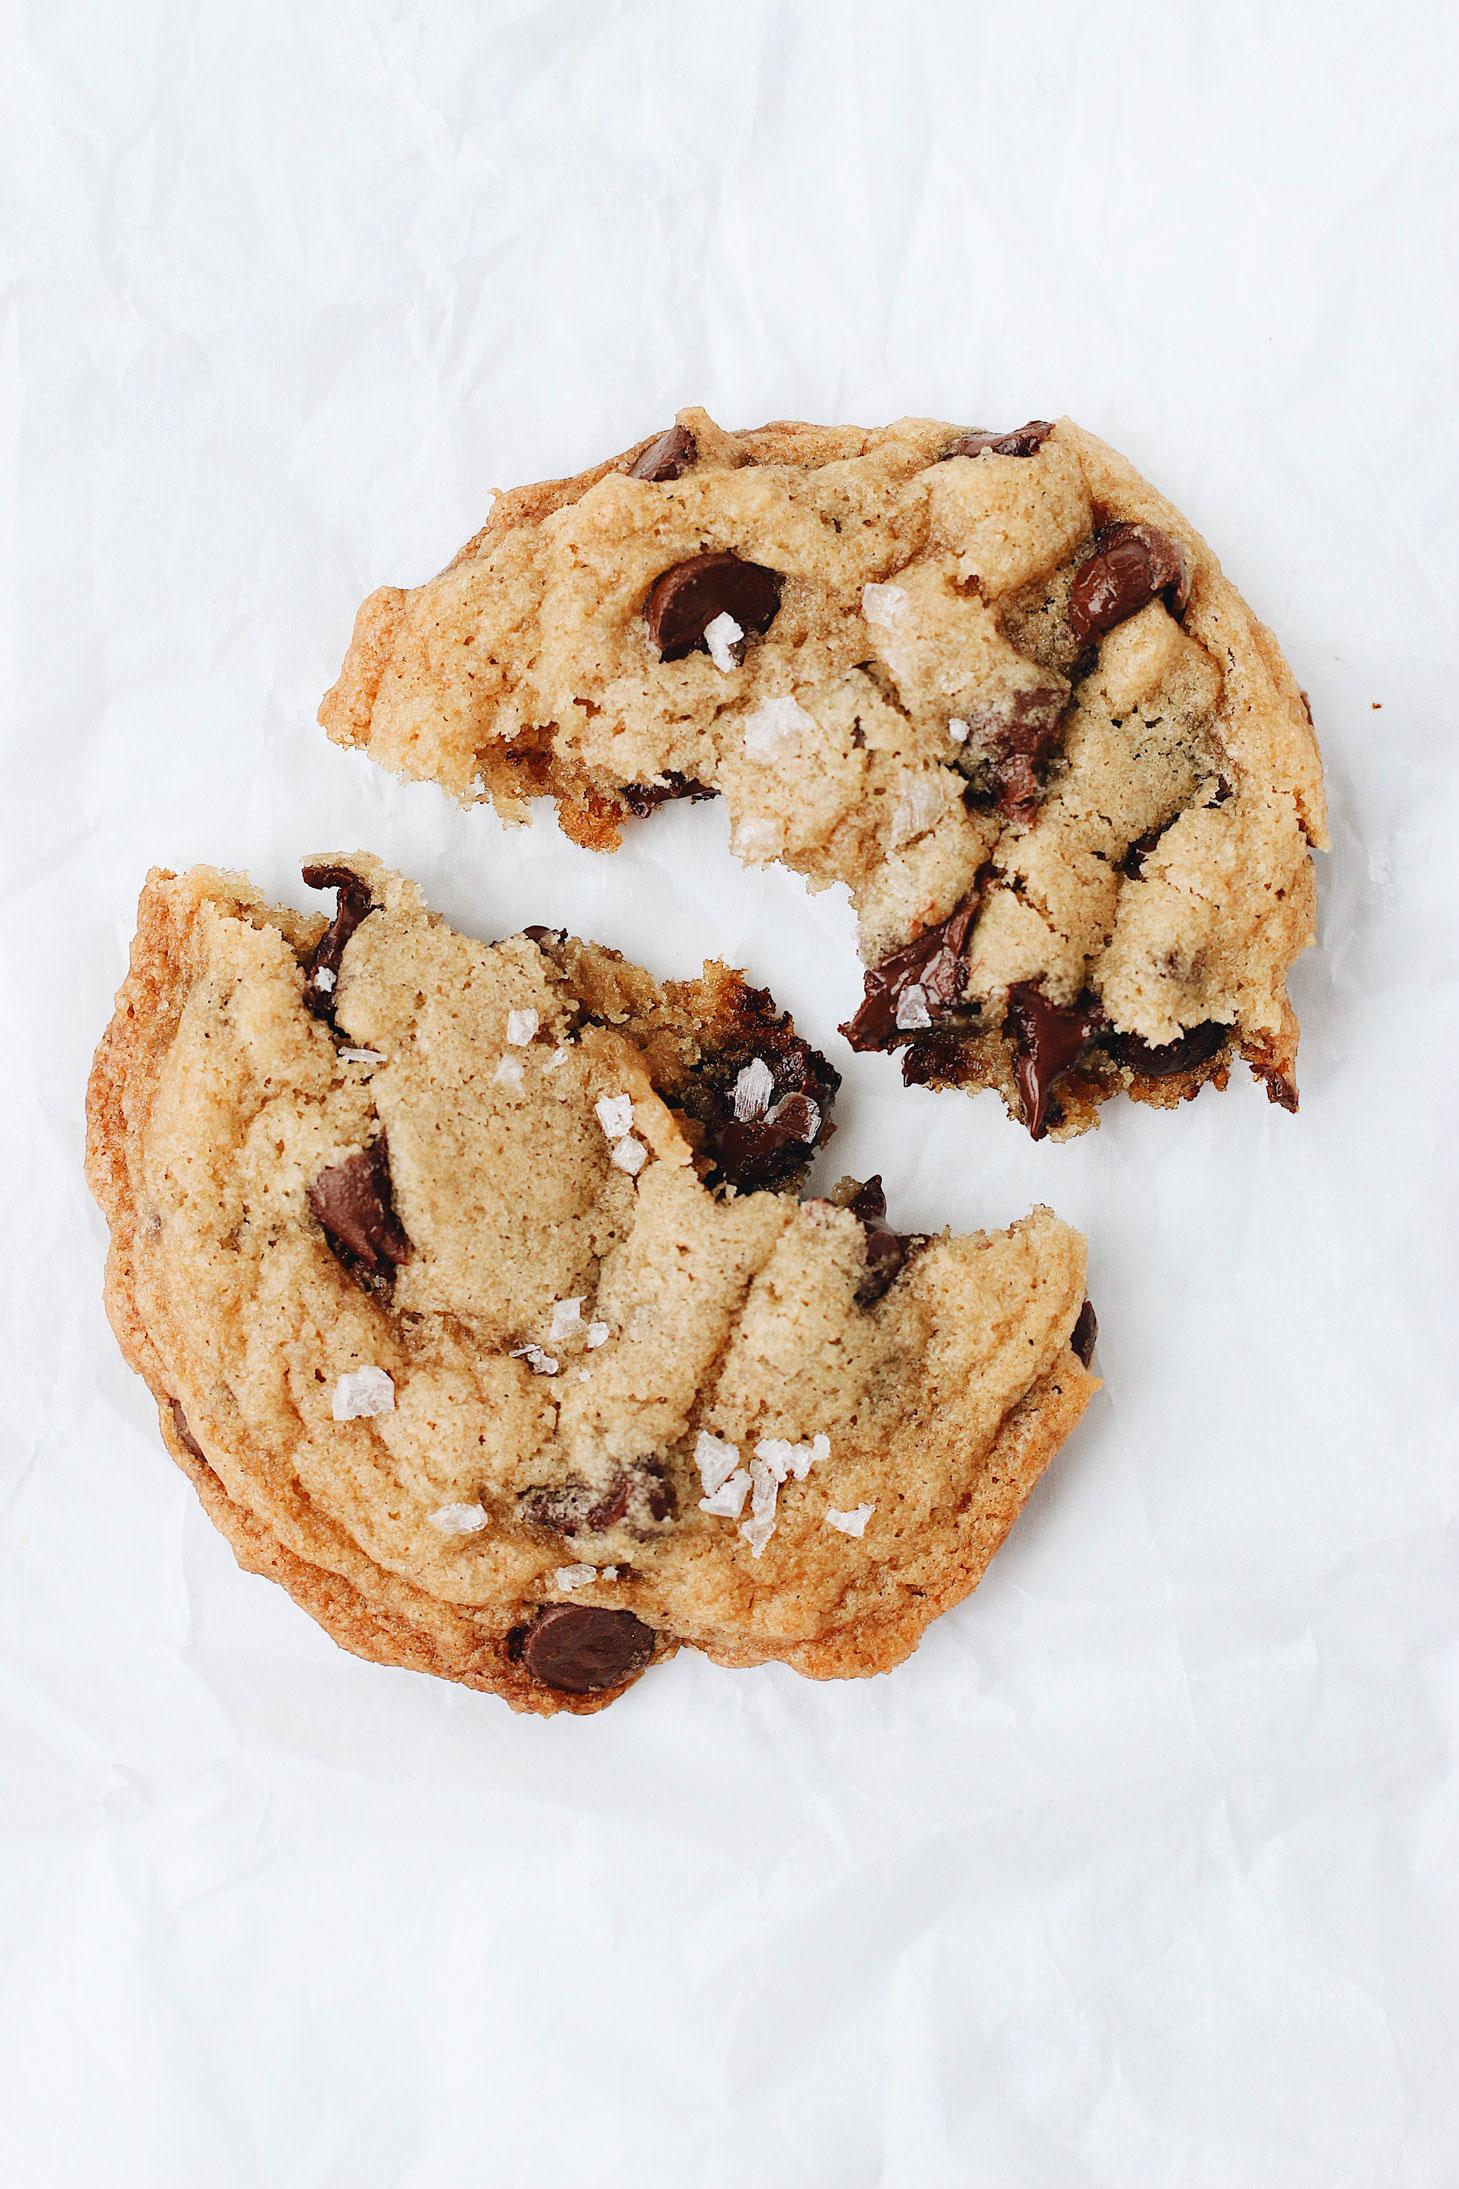 food52-genius-desserts-secretly-vegan-chocolate-chip-cookie